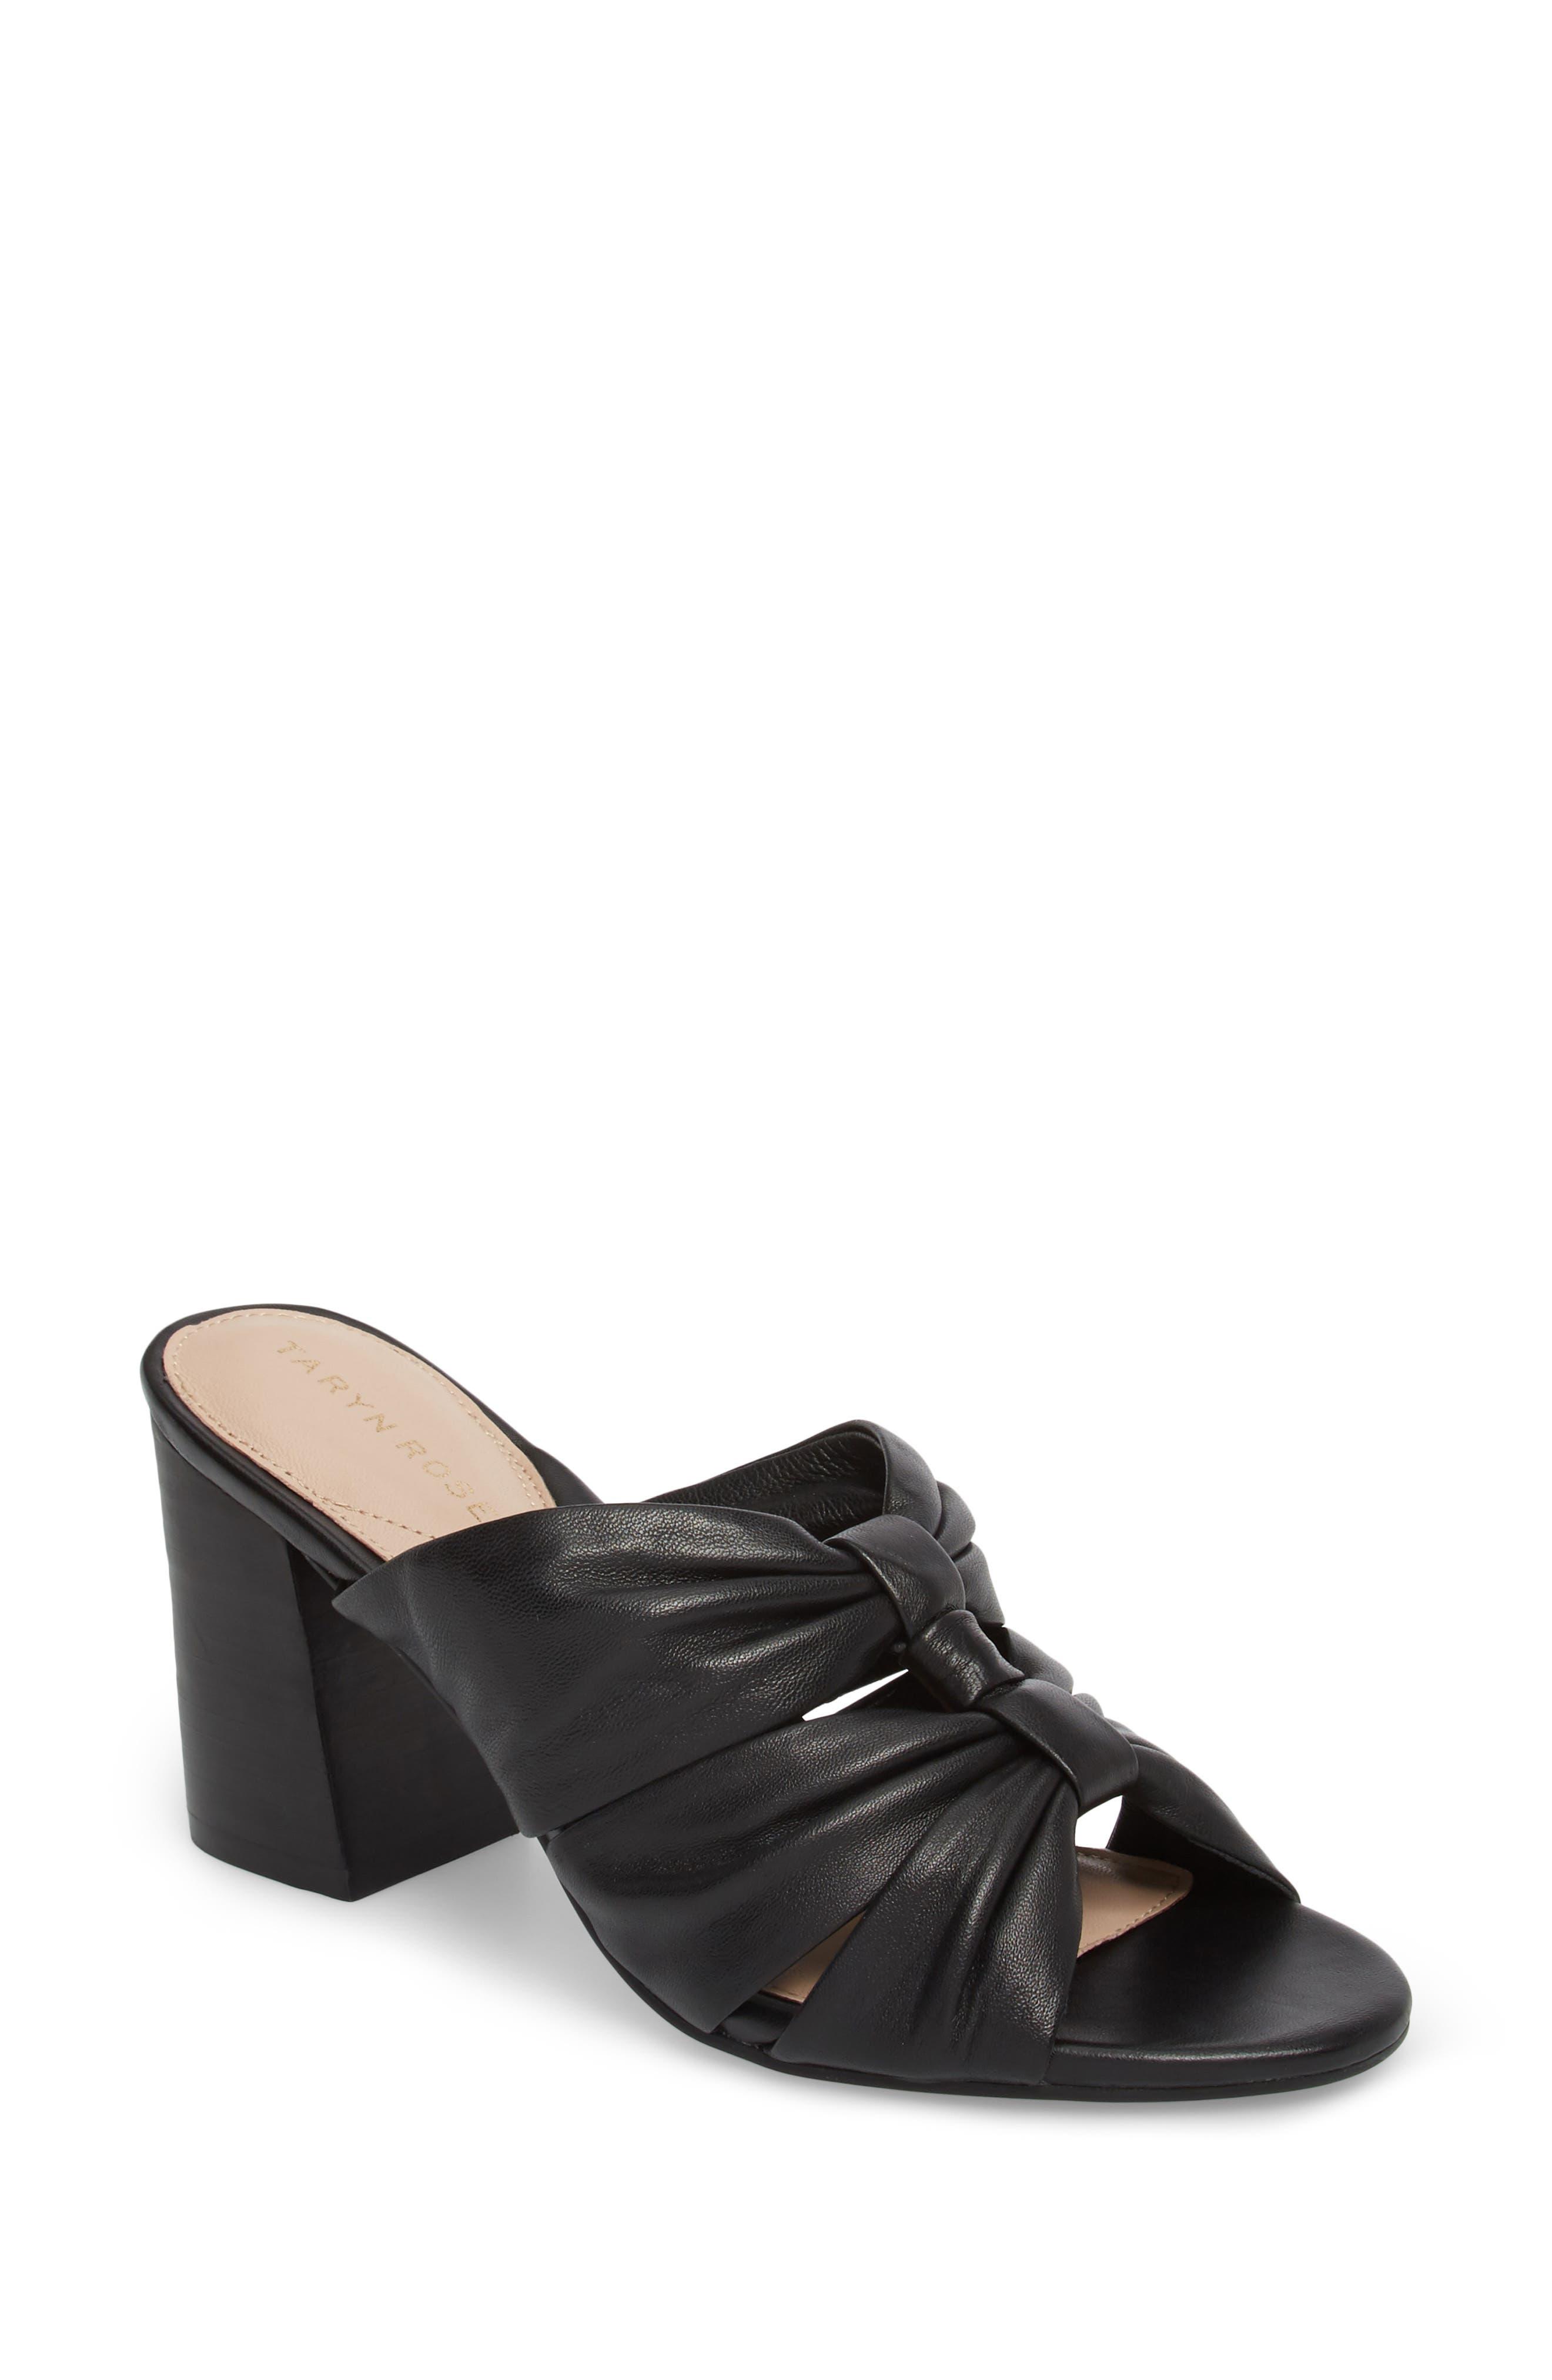 Main Image - Taryn Rose Lana Cinched Strap Sandal (Women)